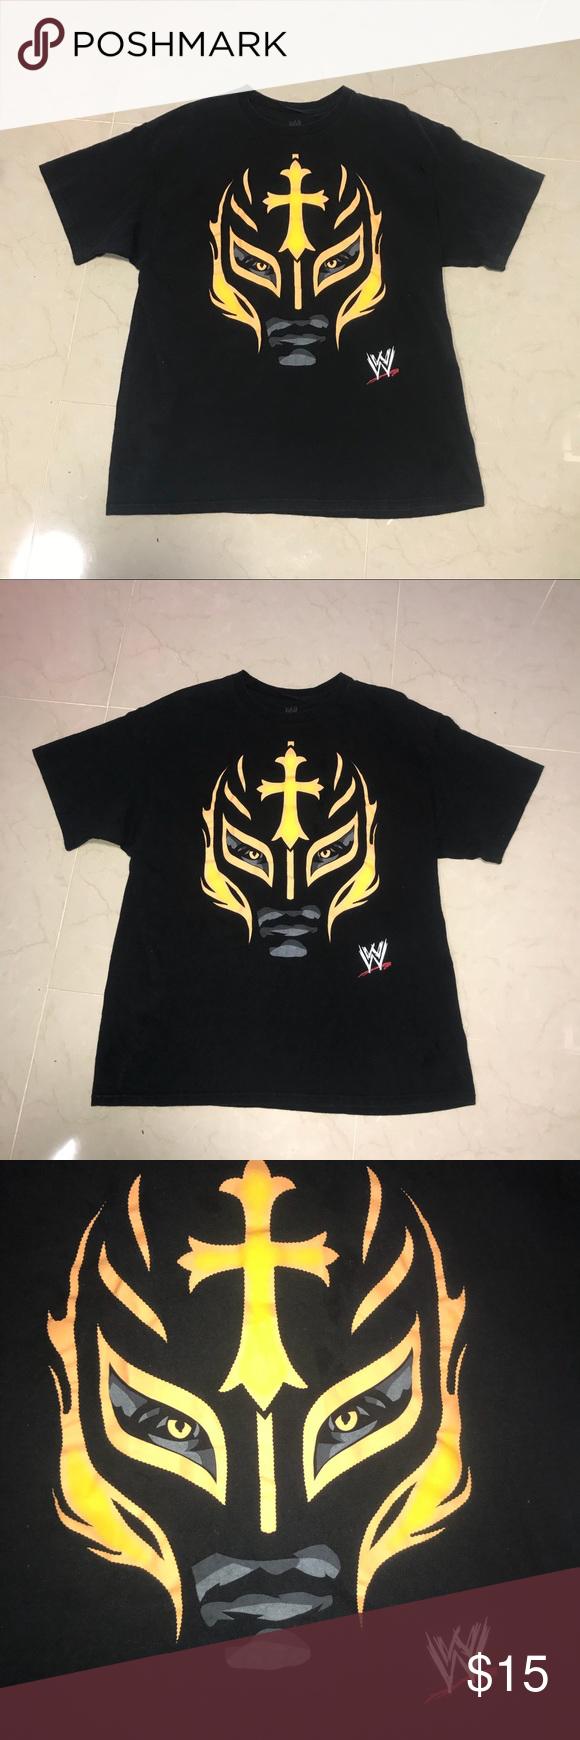 Rey Mysterio Wwe Orange Mask Shirt Xl Cool Shirt With Rey Orange Mask Shirts Tees Short Sleeve Mysterio Wwe Cool Shirts Shirts